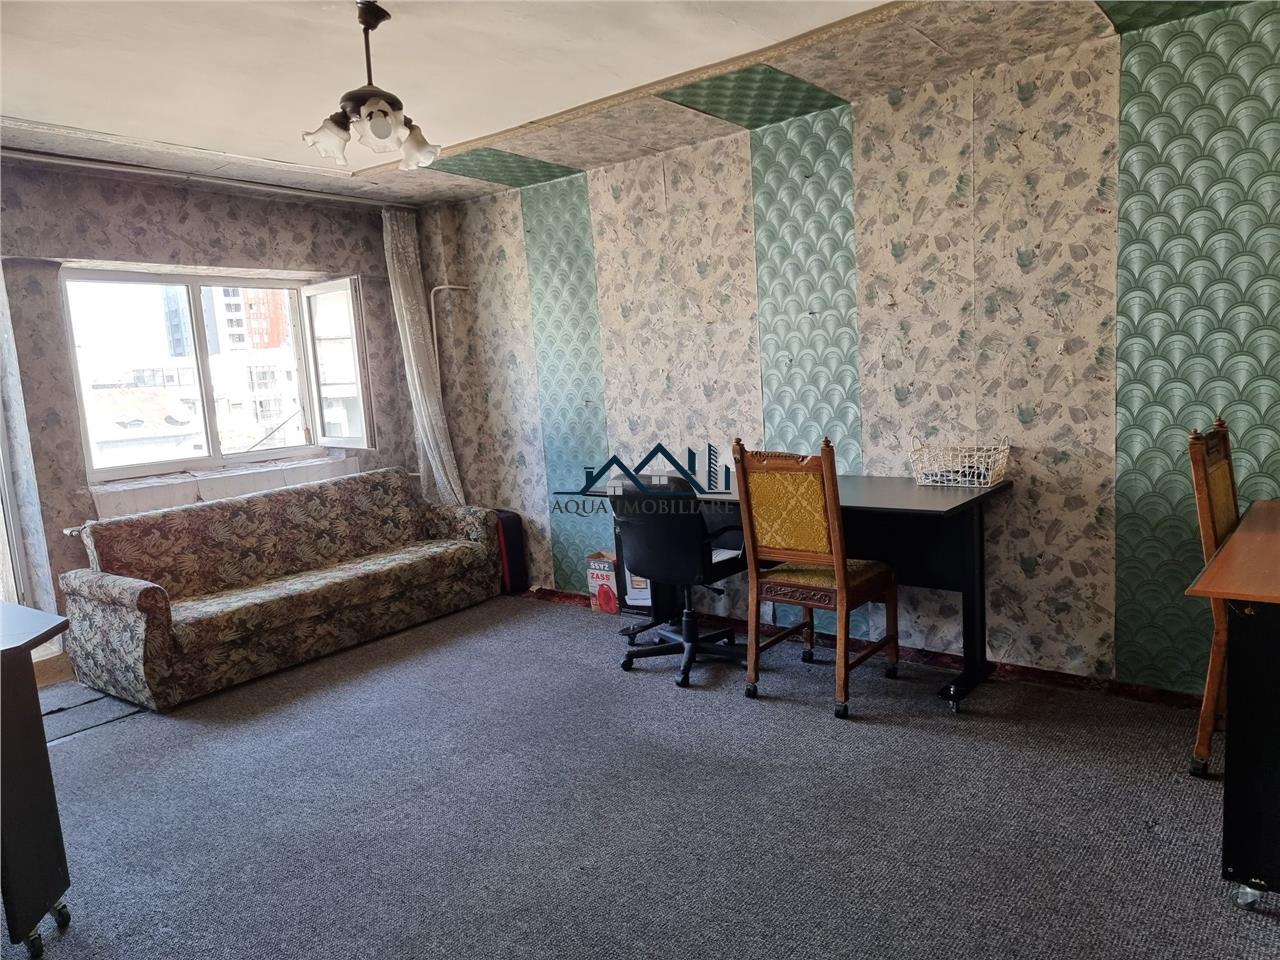 Vanzare apartament 4 camere Unirii magazin